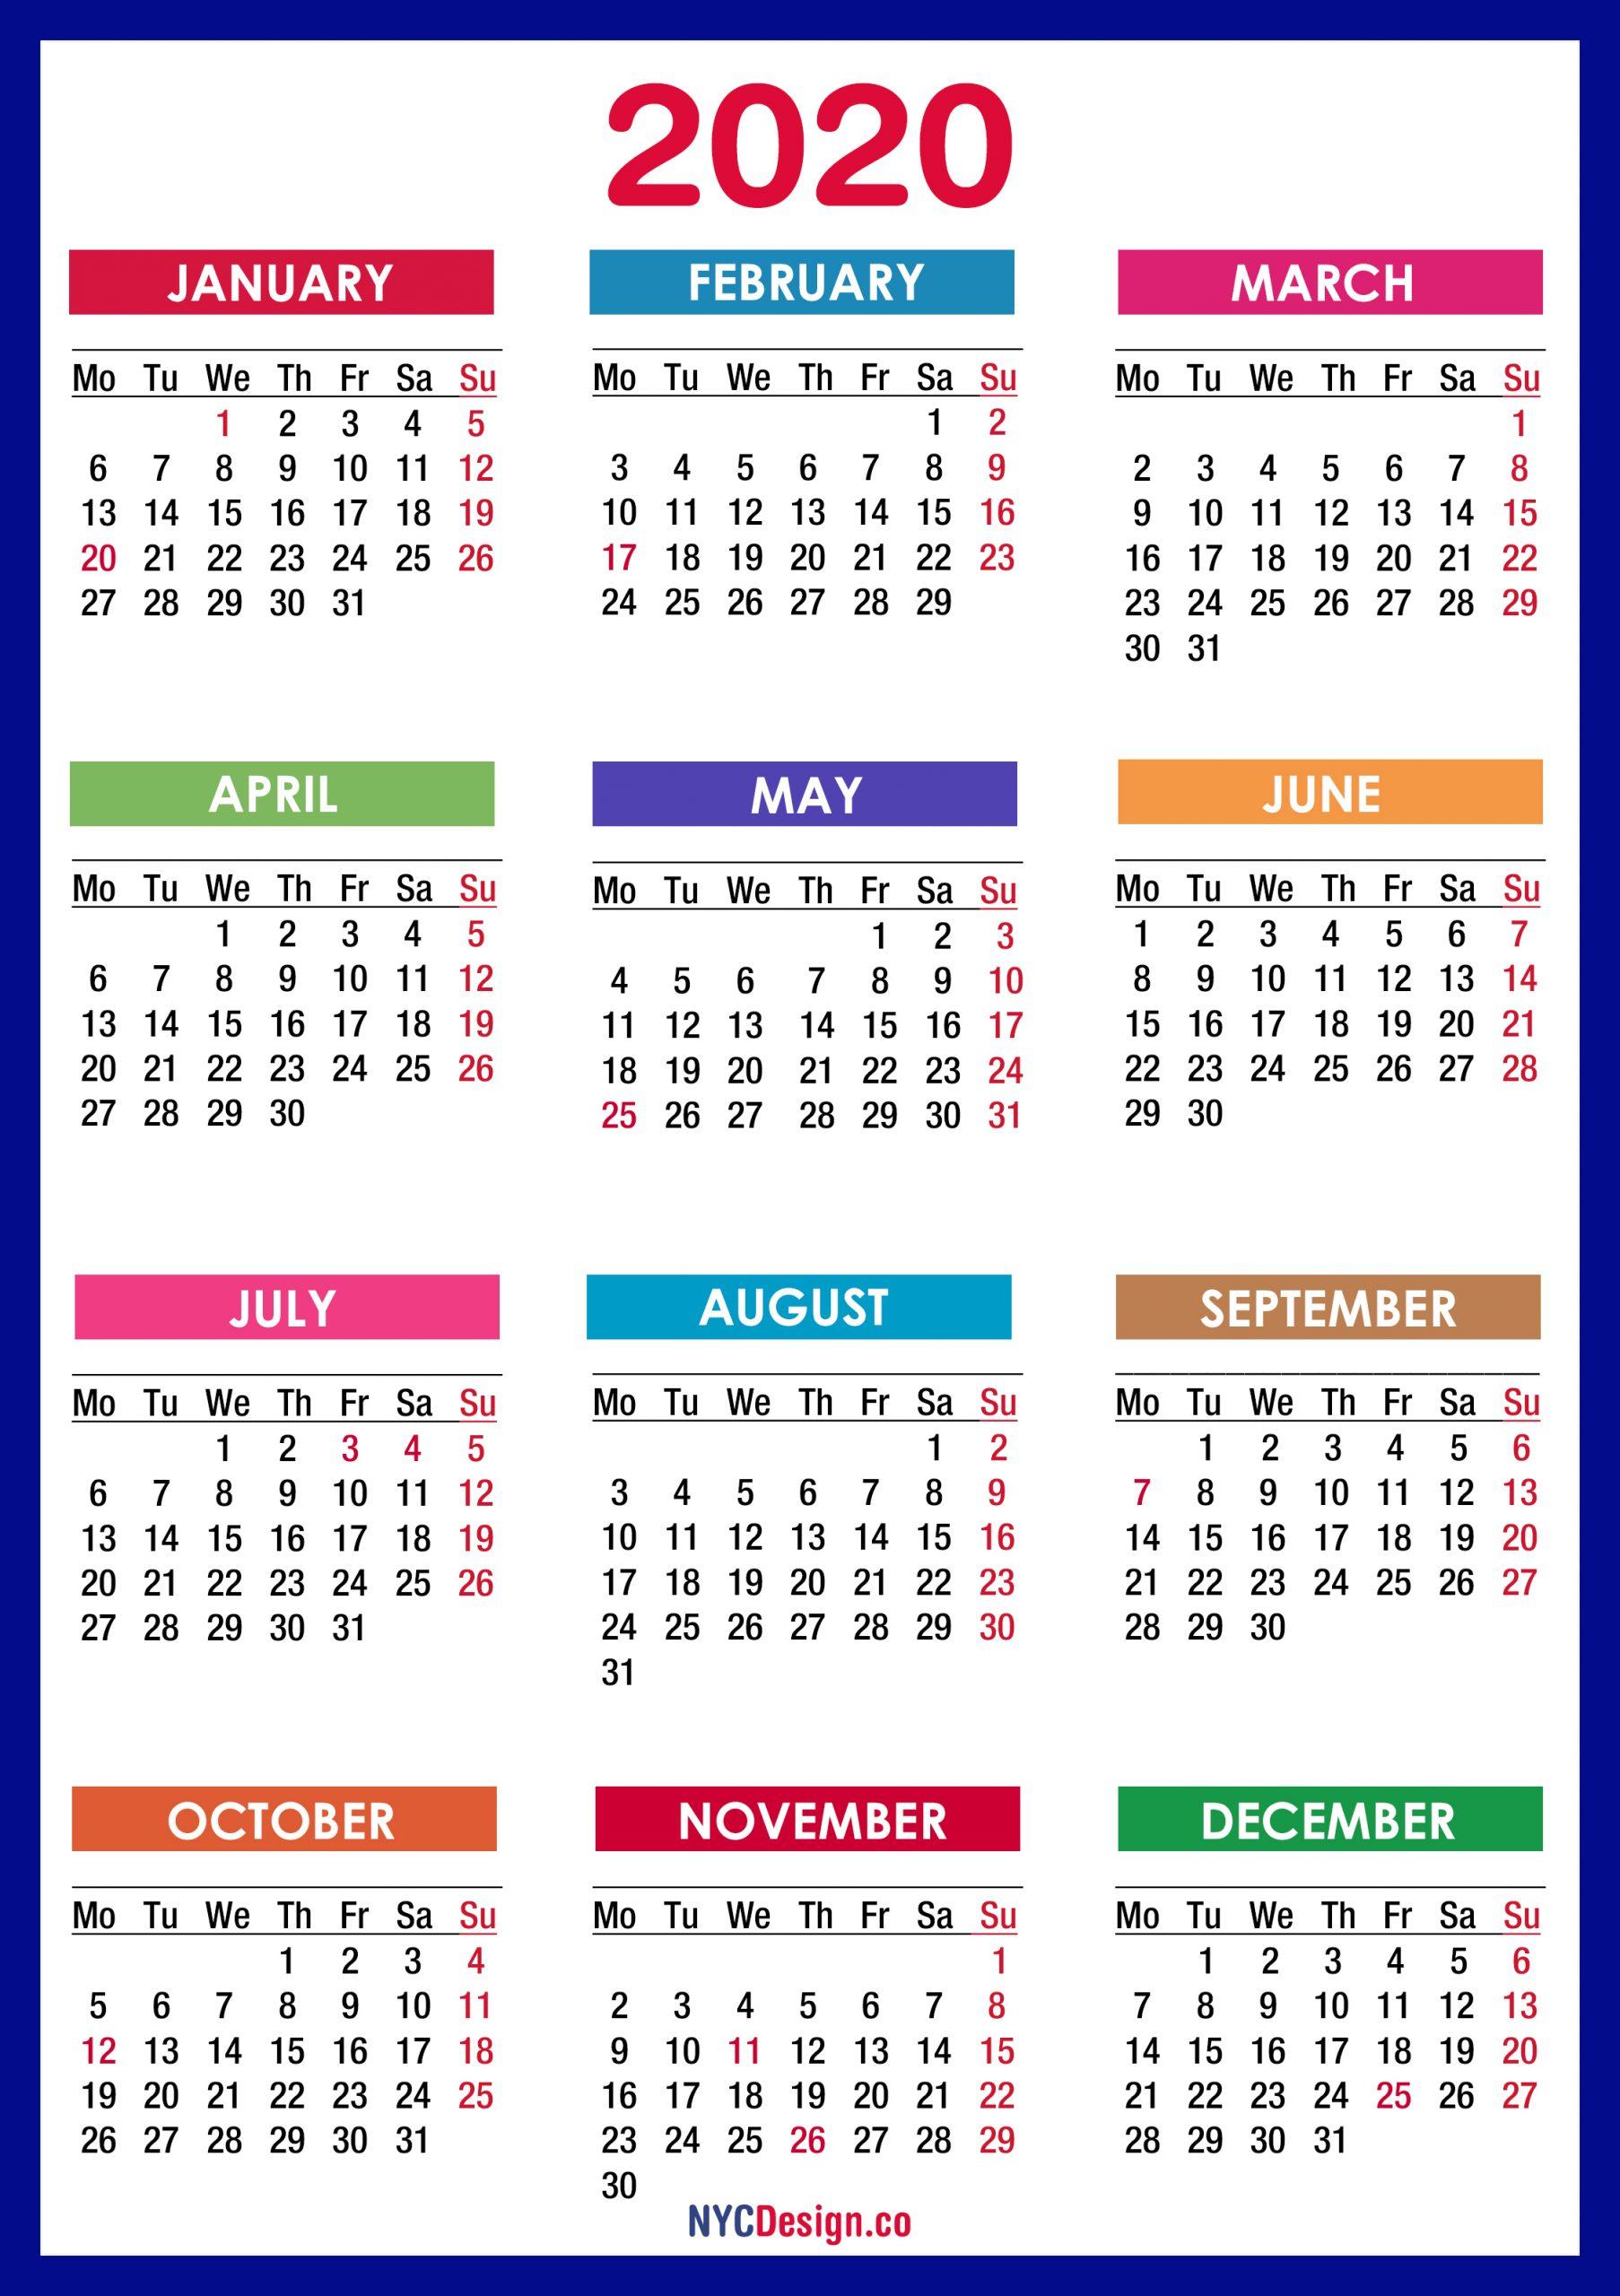 2020 Calendar With Holidays, Printable Free, Pdf, Colorful